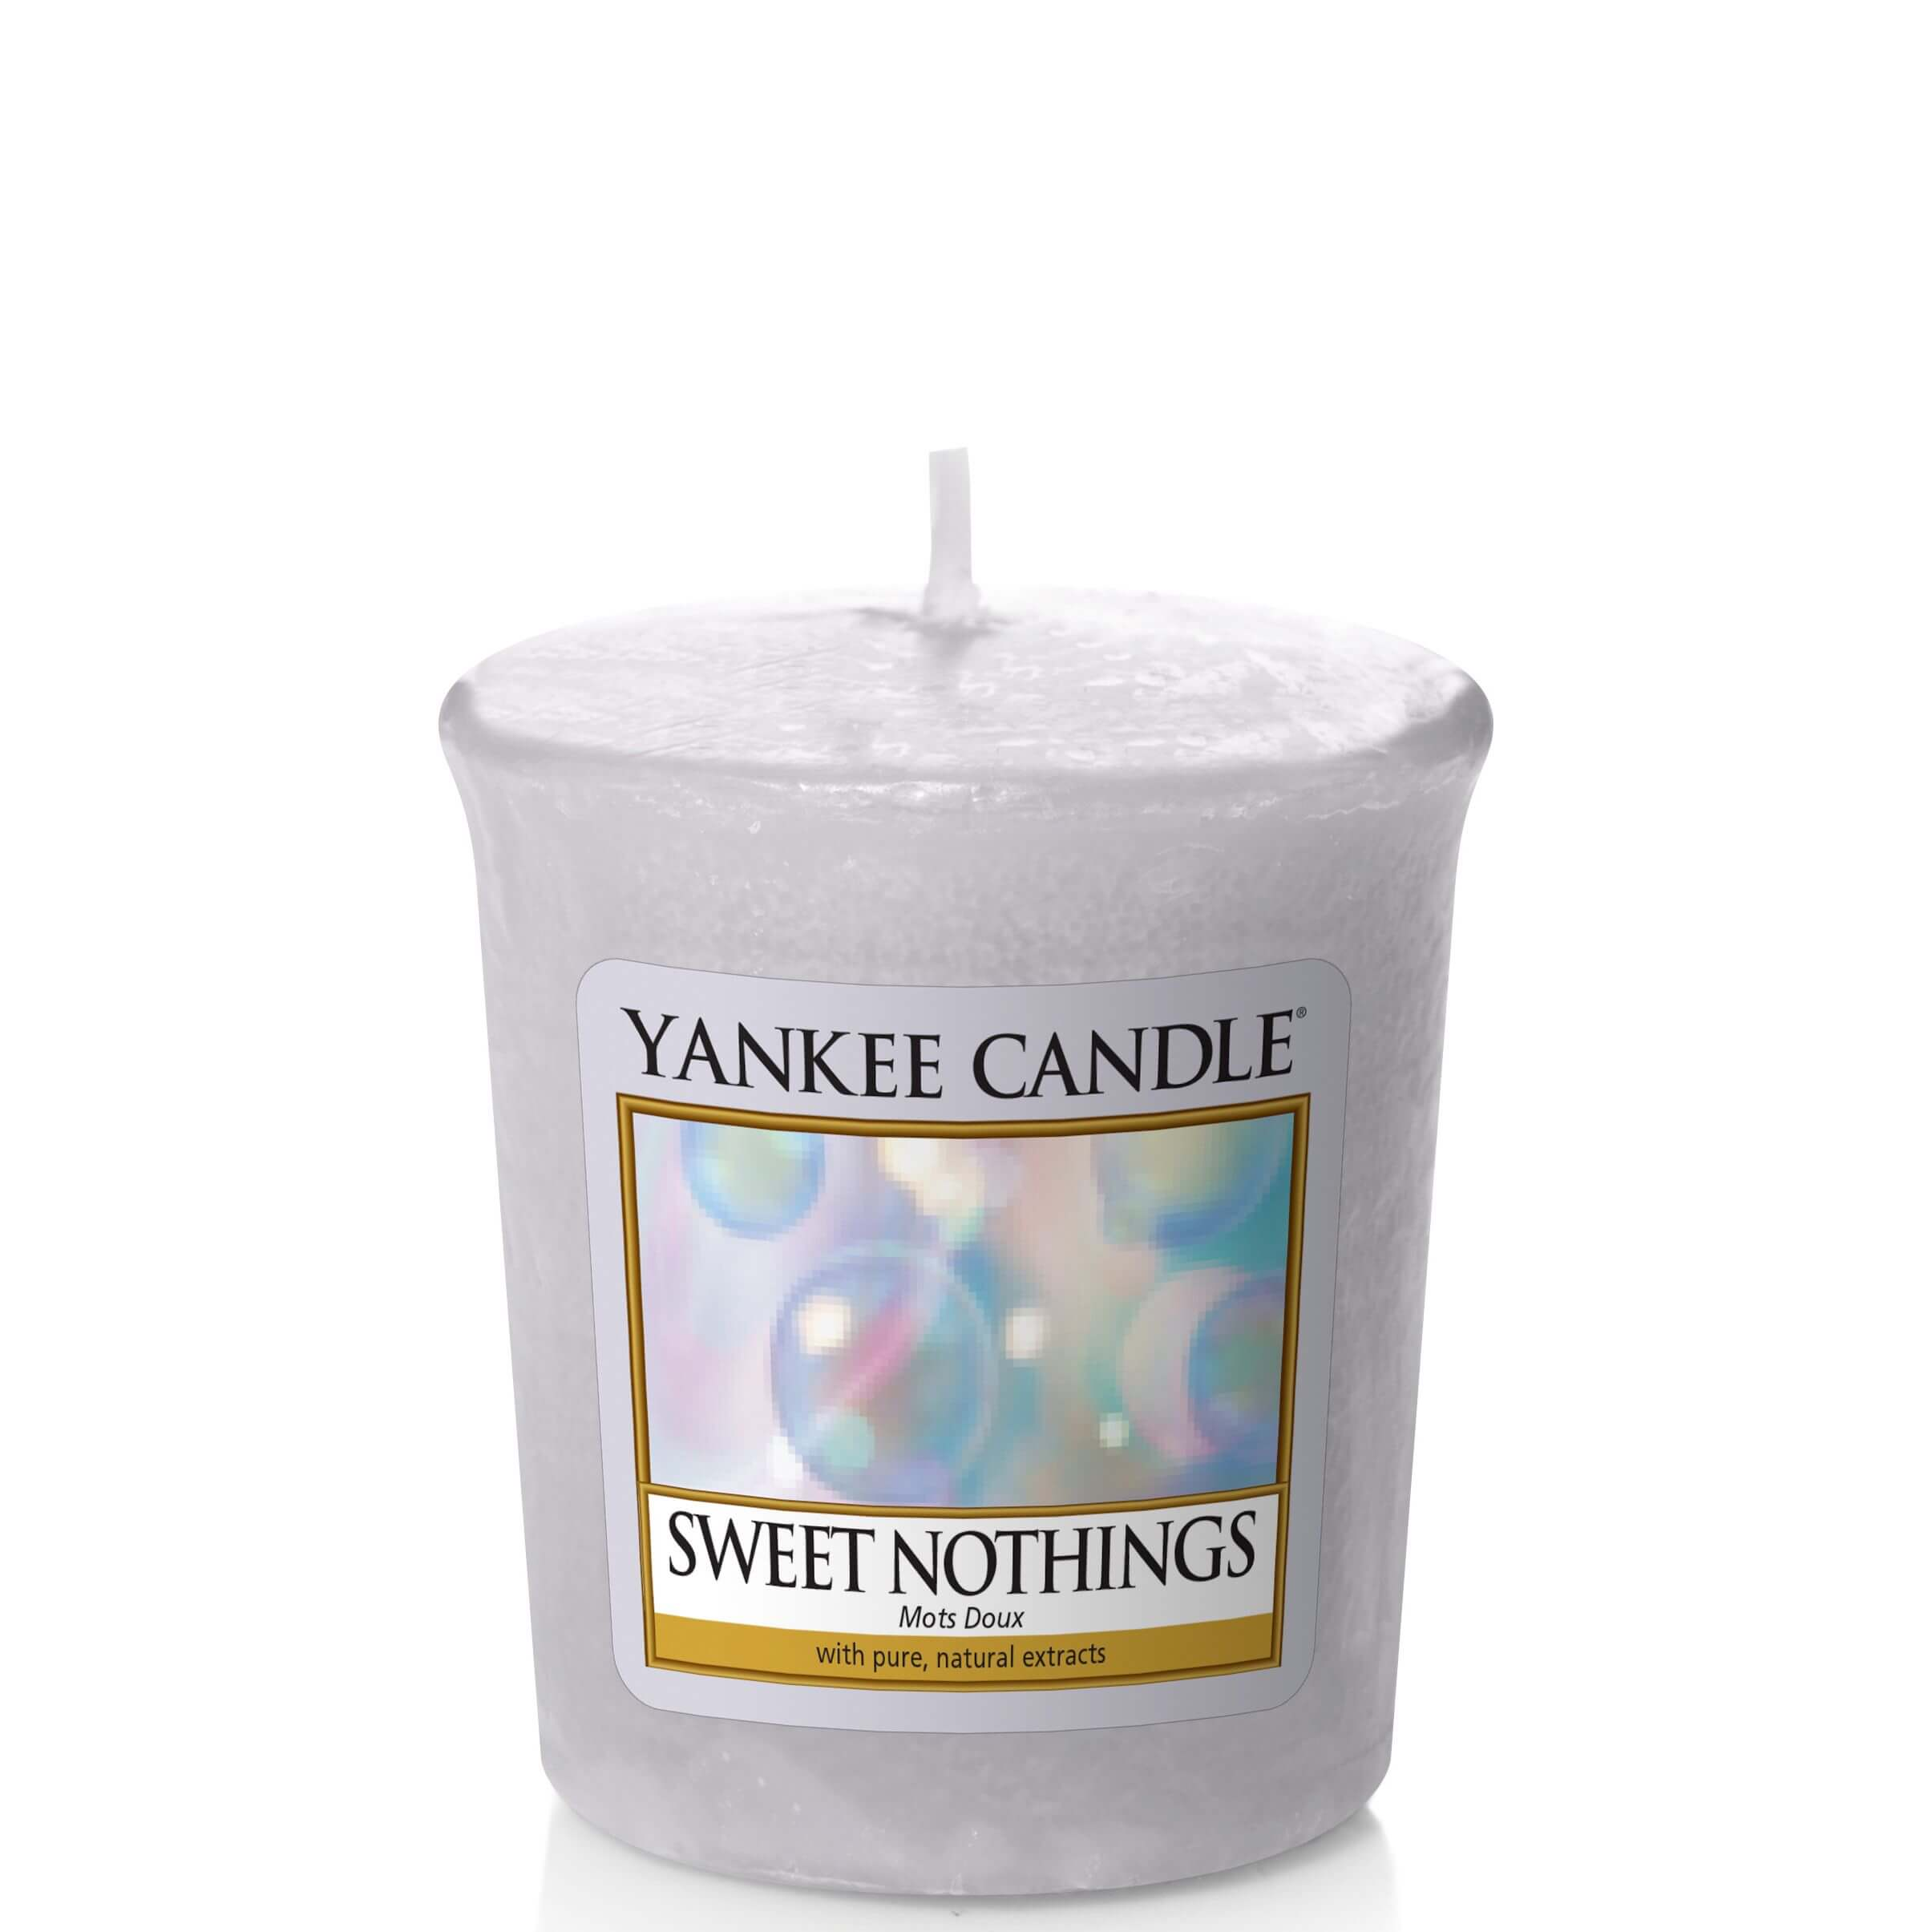 sweet nothings 49g votivkerze von yankee candle online bestellen candle dream. Black Bedroom Furniture Sets. Home Design Ideas